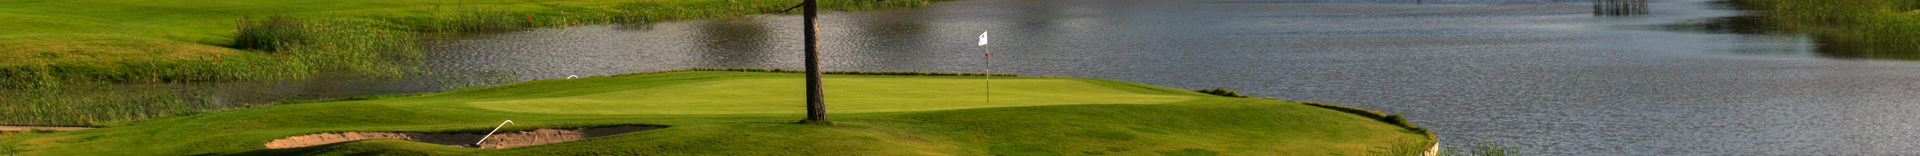 golfikeskus_vaike4